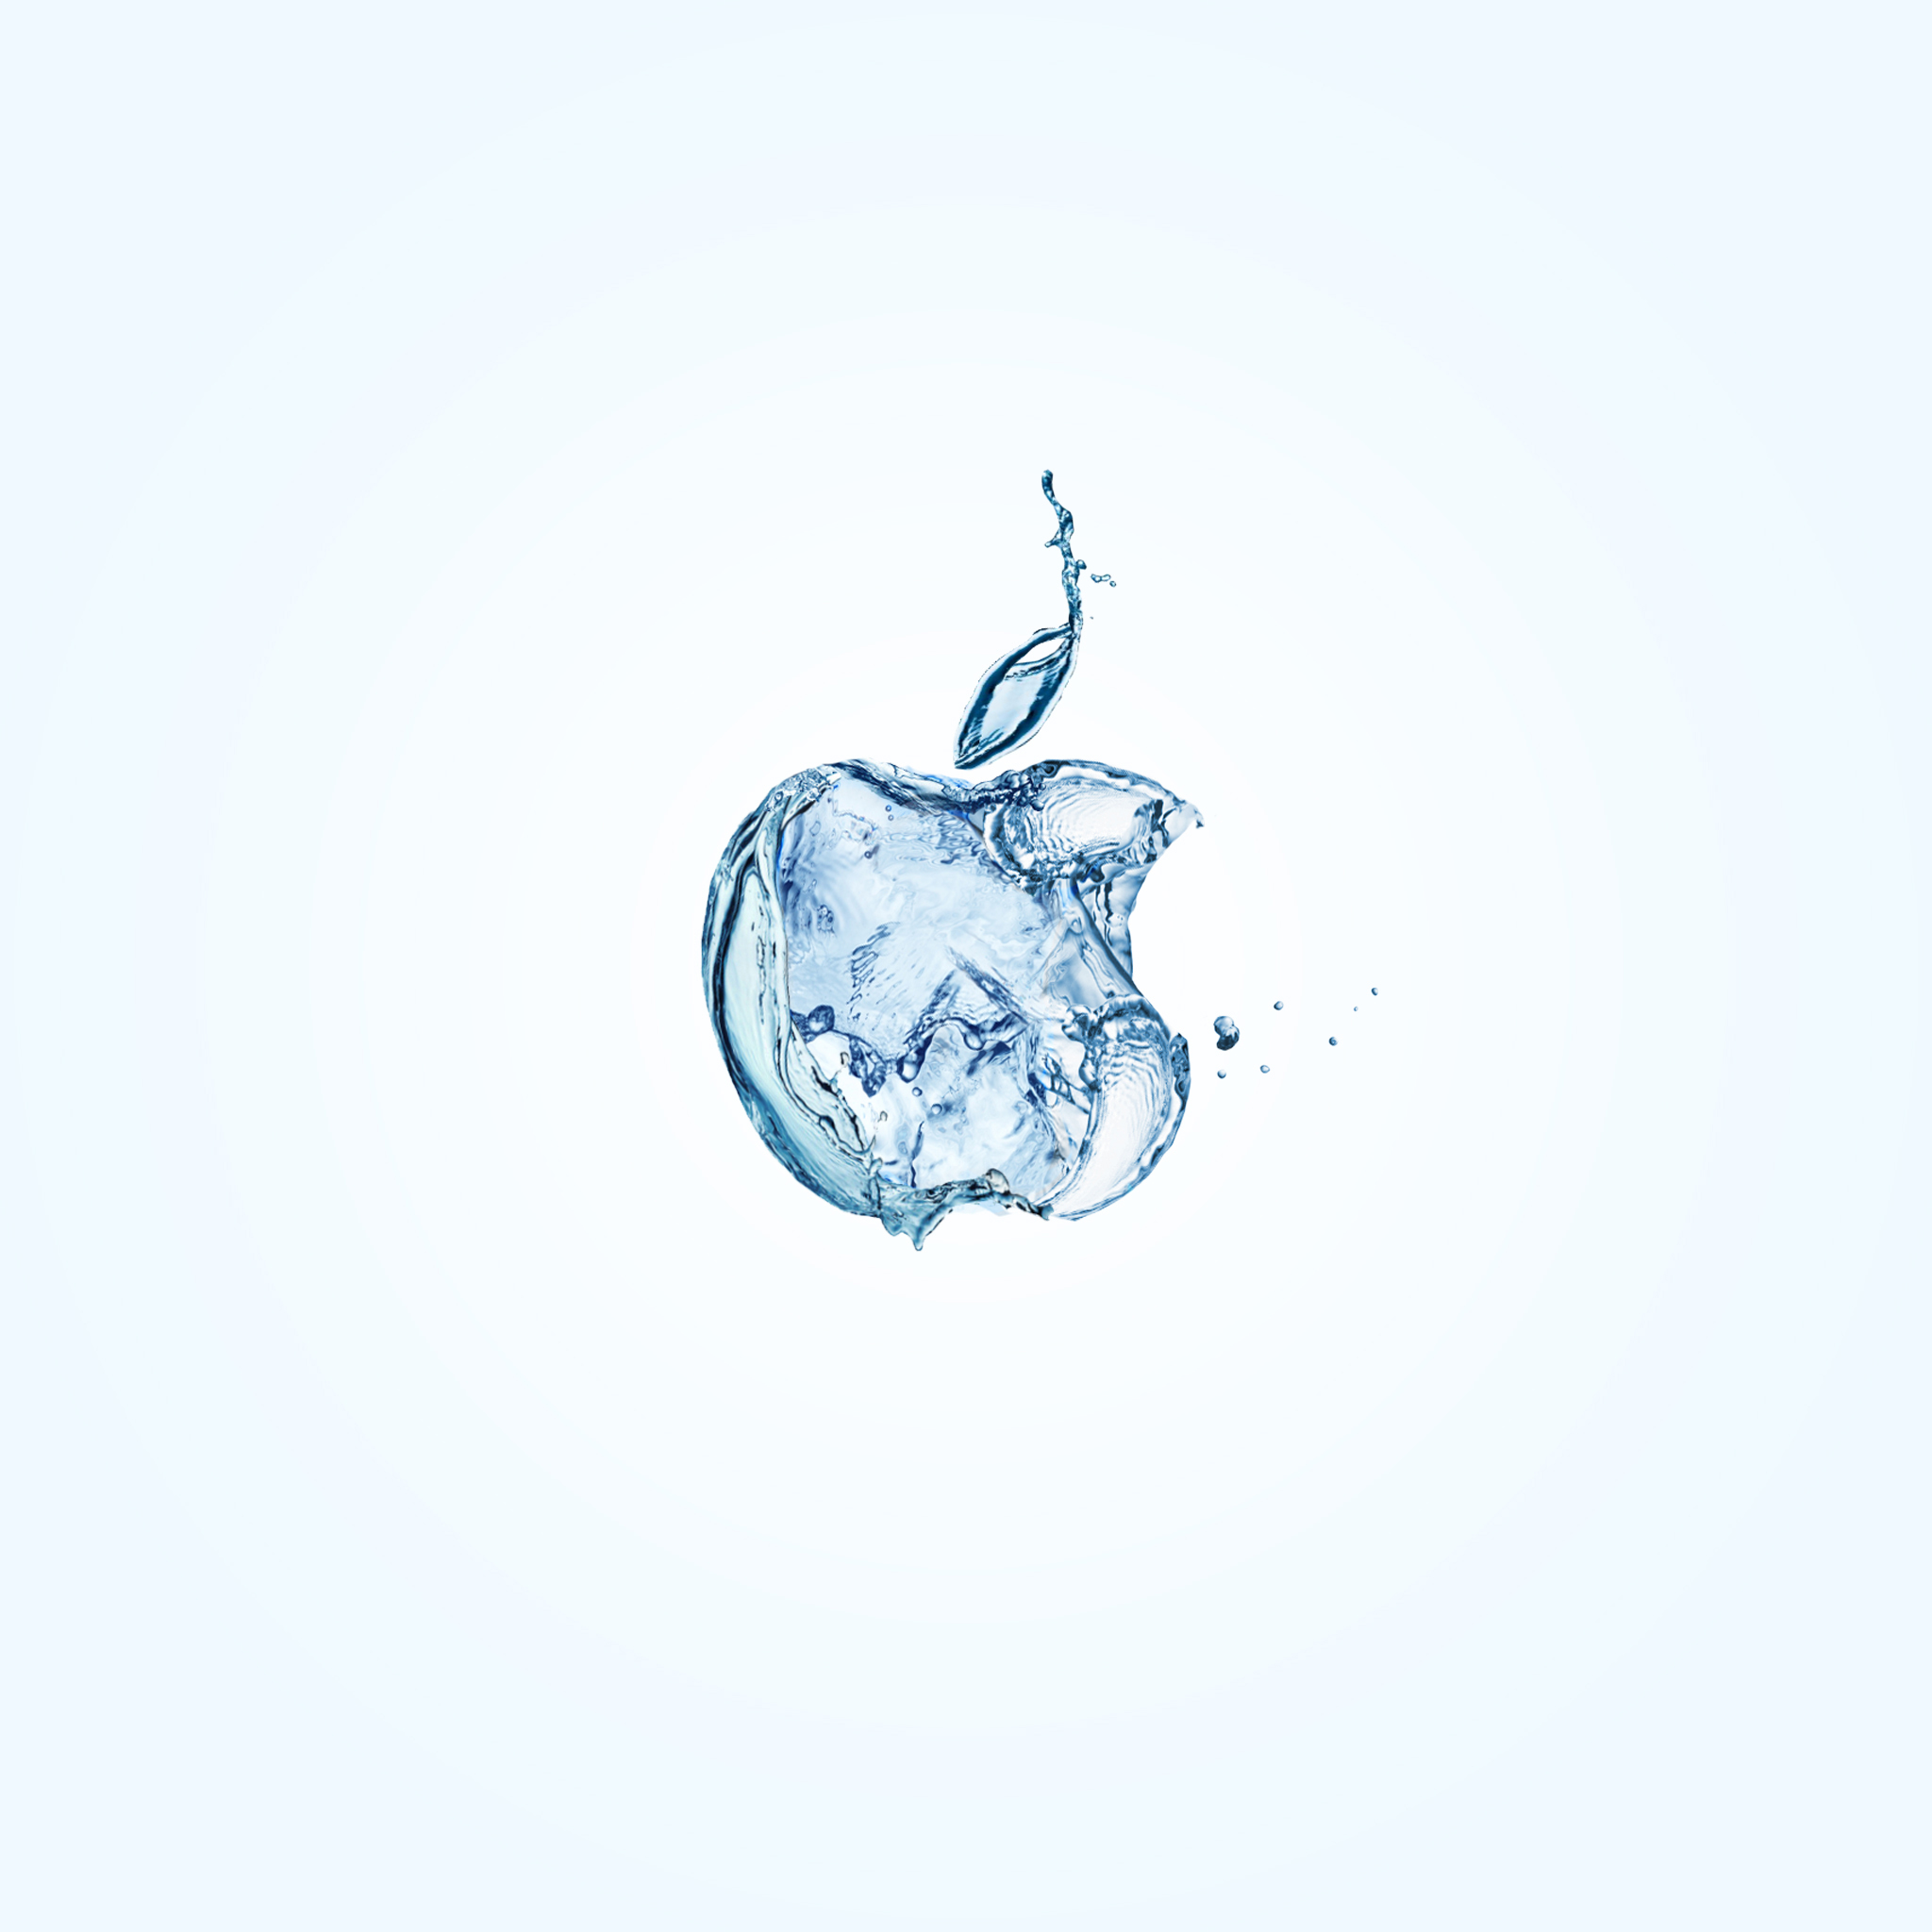 Water Apple 3Wallpapers iPad Retina Water Apple   iPad Retina